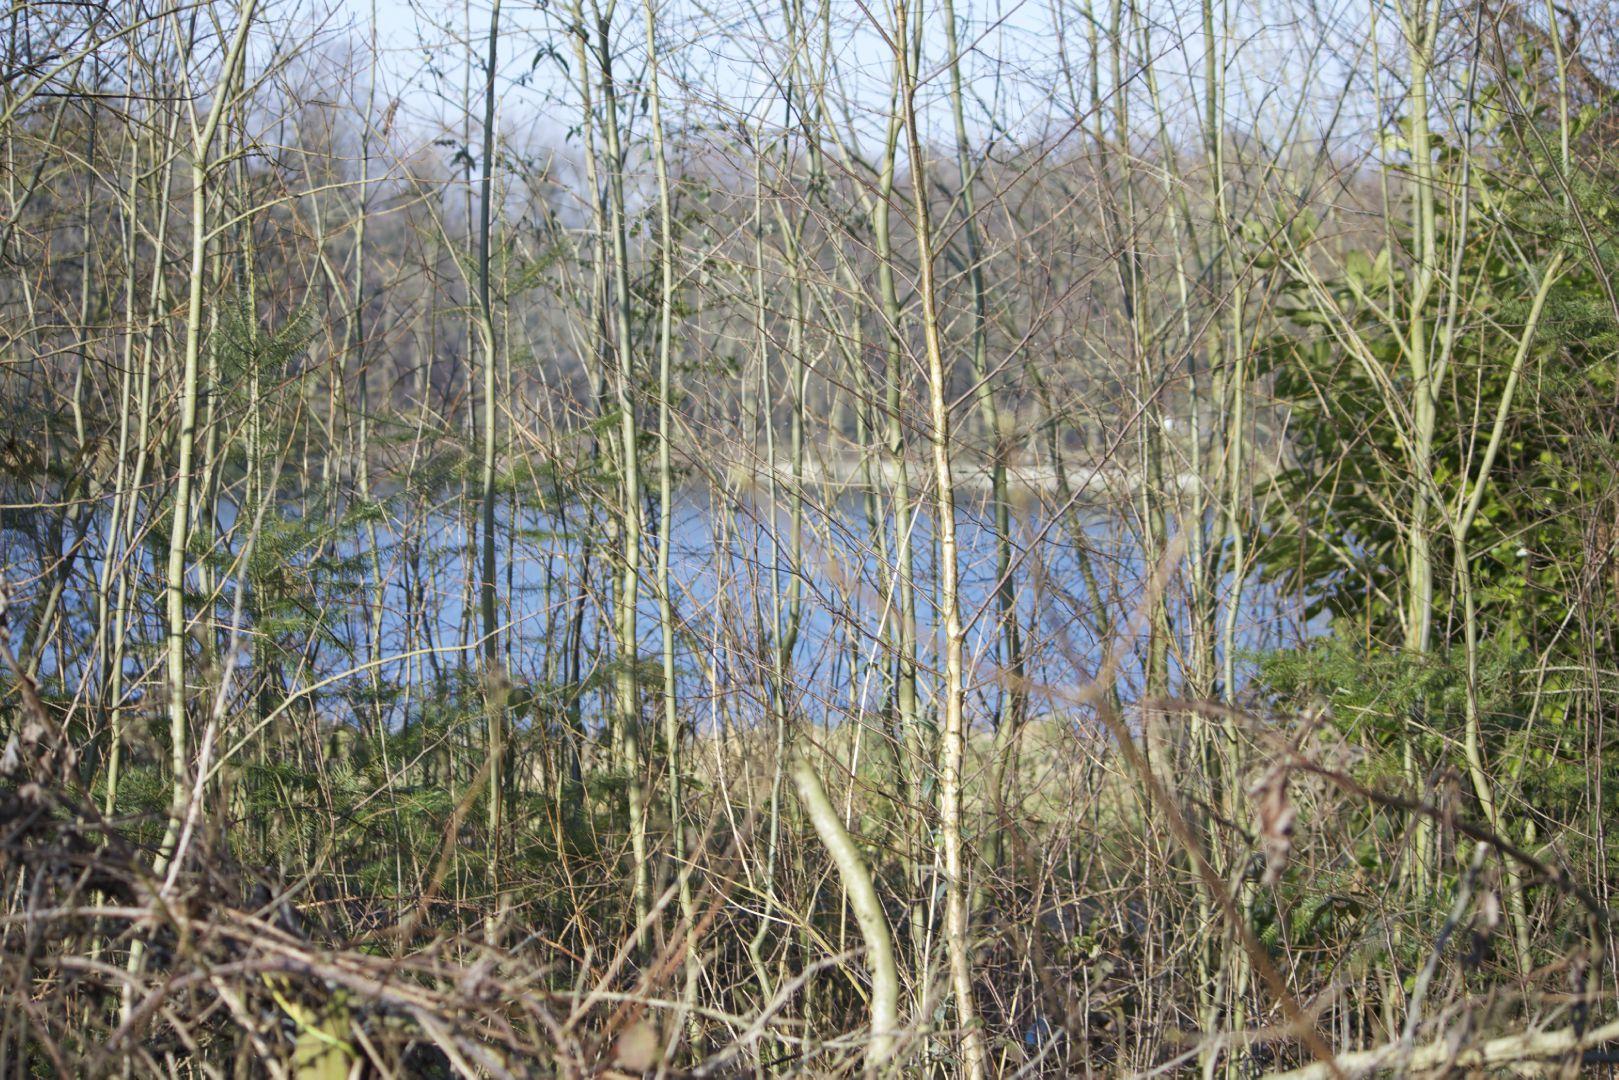 Perceel VILLAGROND 1977 m2 – subliem zicht op de Lac van Loppem